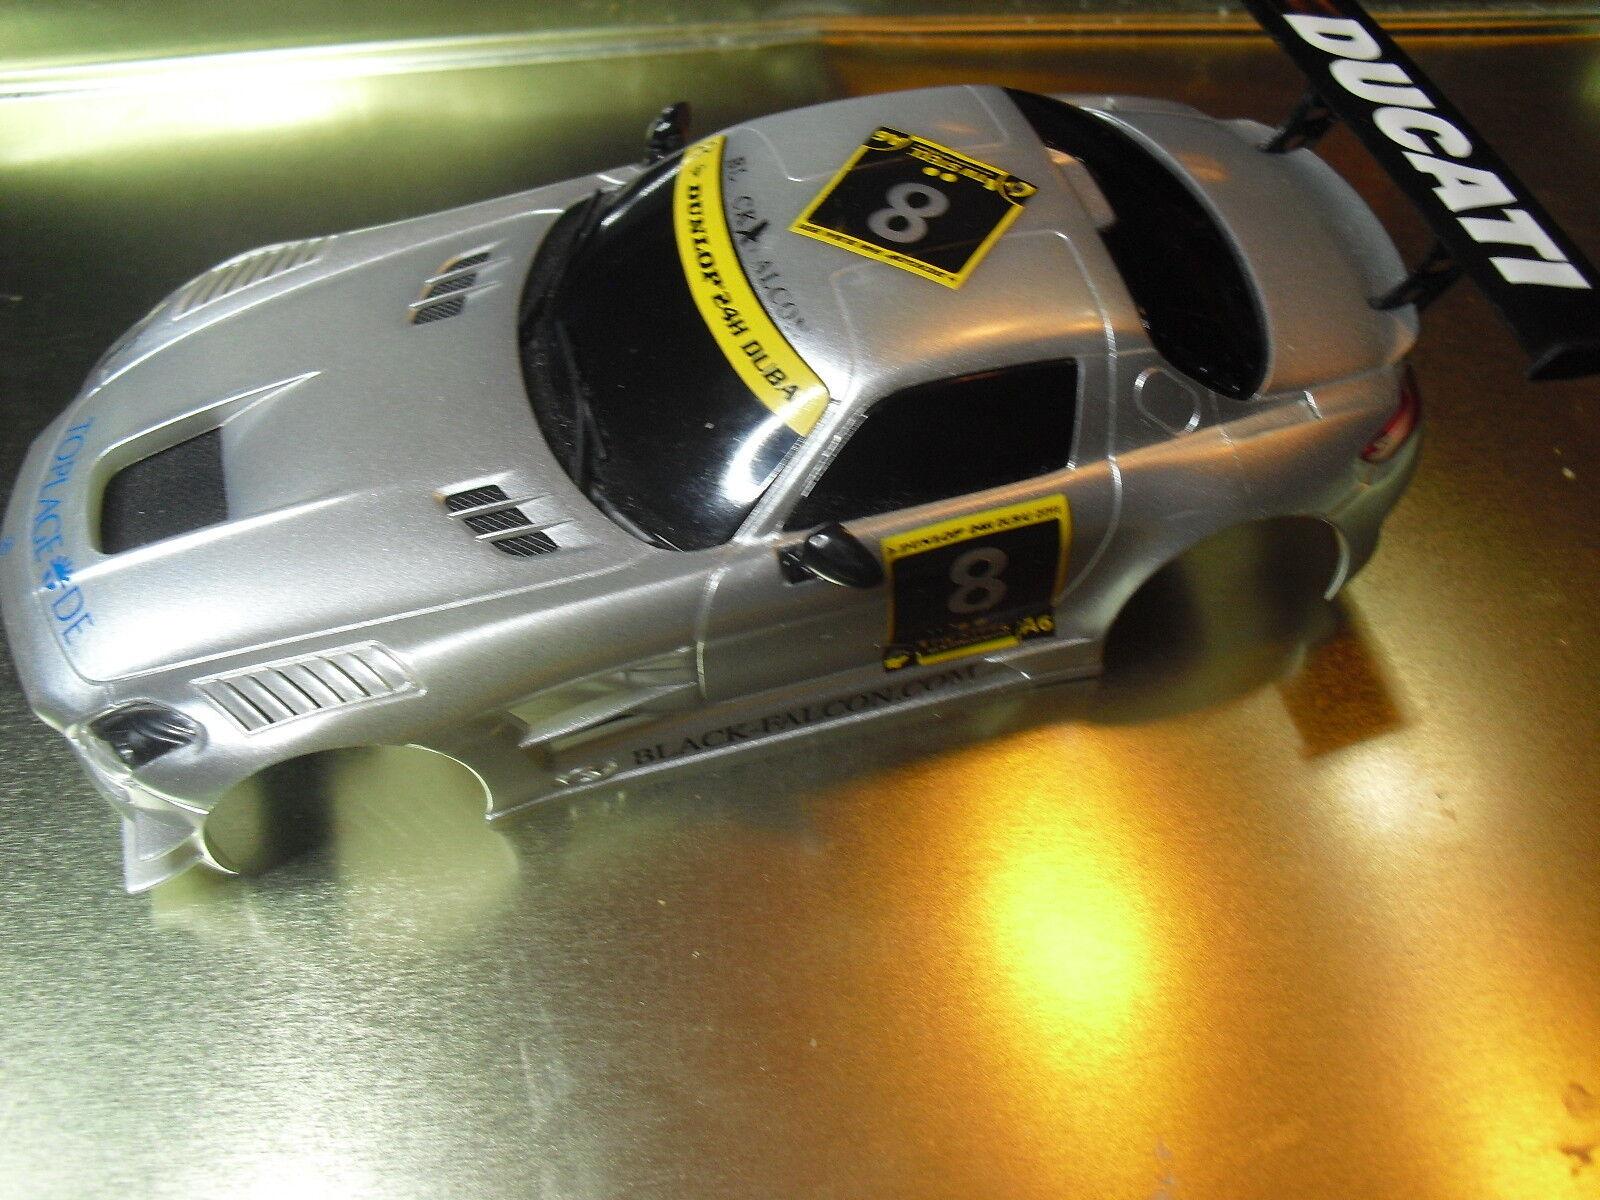 SCX BODYWORK MERCEDES BENZ SLS AMG GT3 DUCATI DUCATI DUCATI NEW 1 32 5be2ac